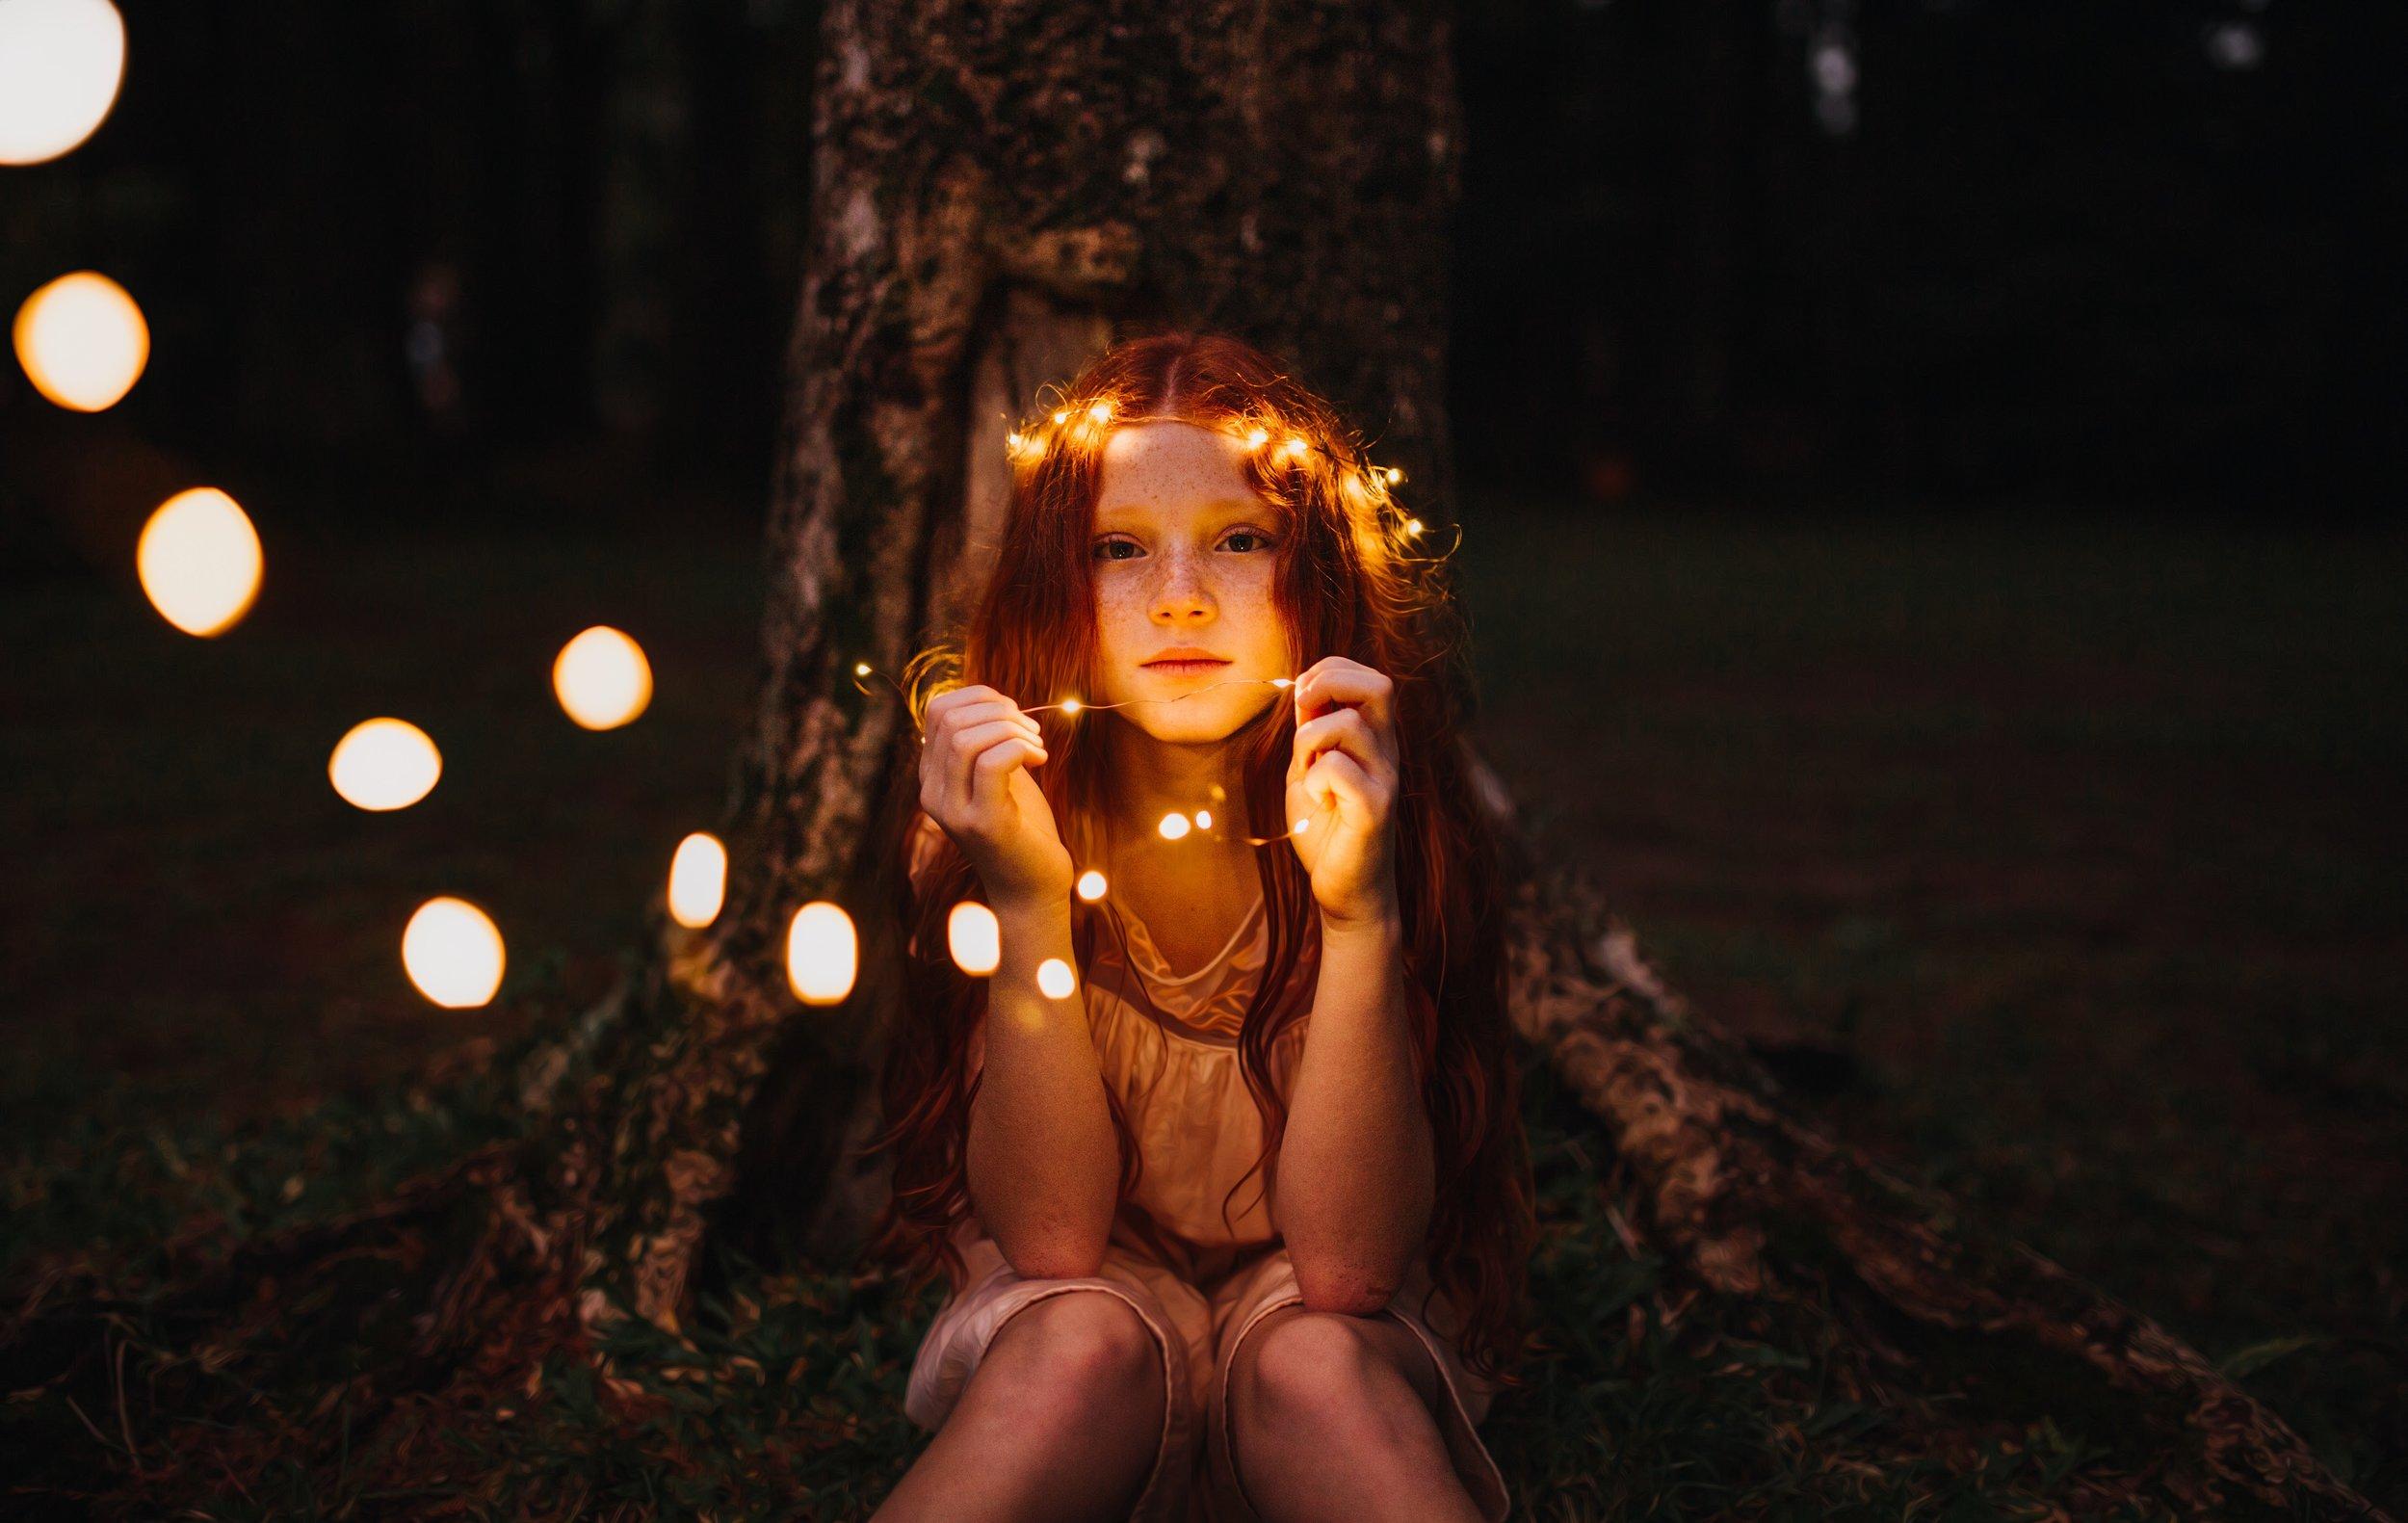 adorable-beautiful-blur-573298.jpg